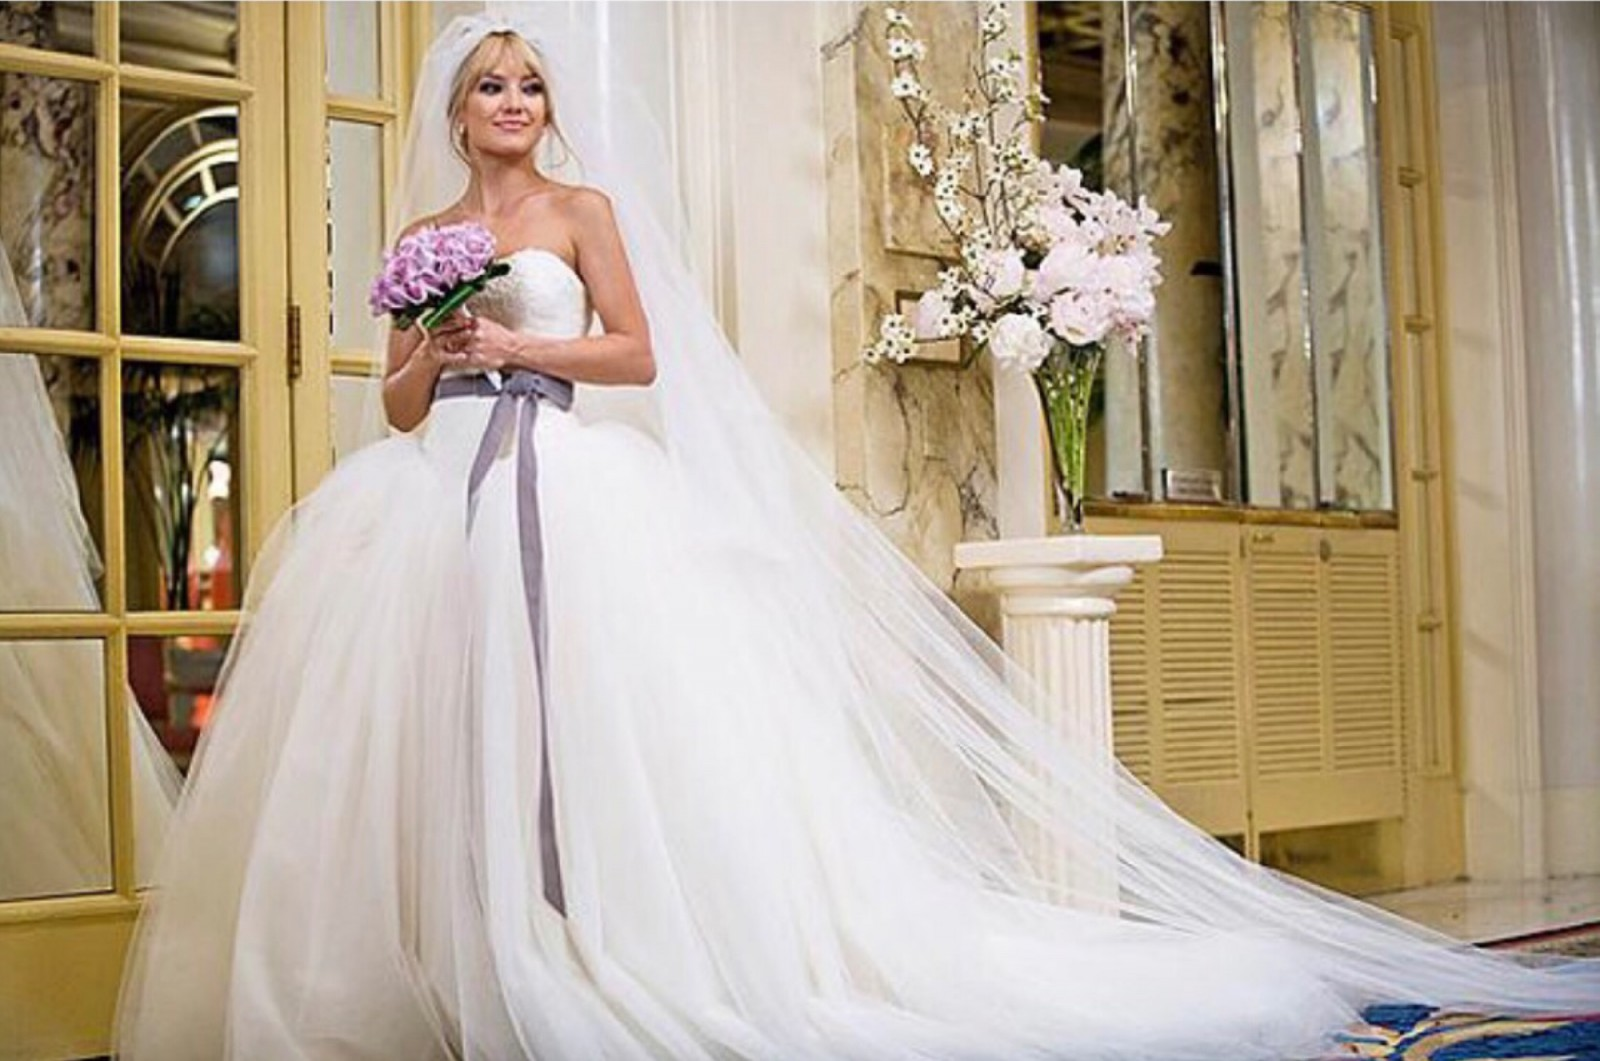 07c7536cc20c Vera Wang Bride Wars original - Kate Hudson ...style 12709 Preloved Wedding  Dress on Sale 62% Off - Stillwhite United Kingdom